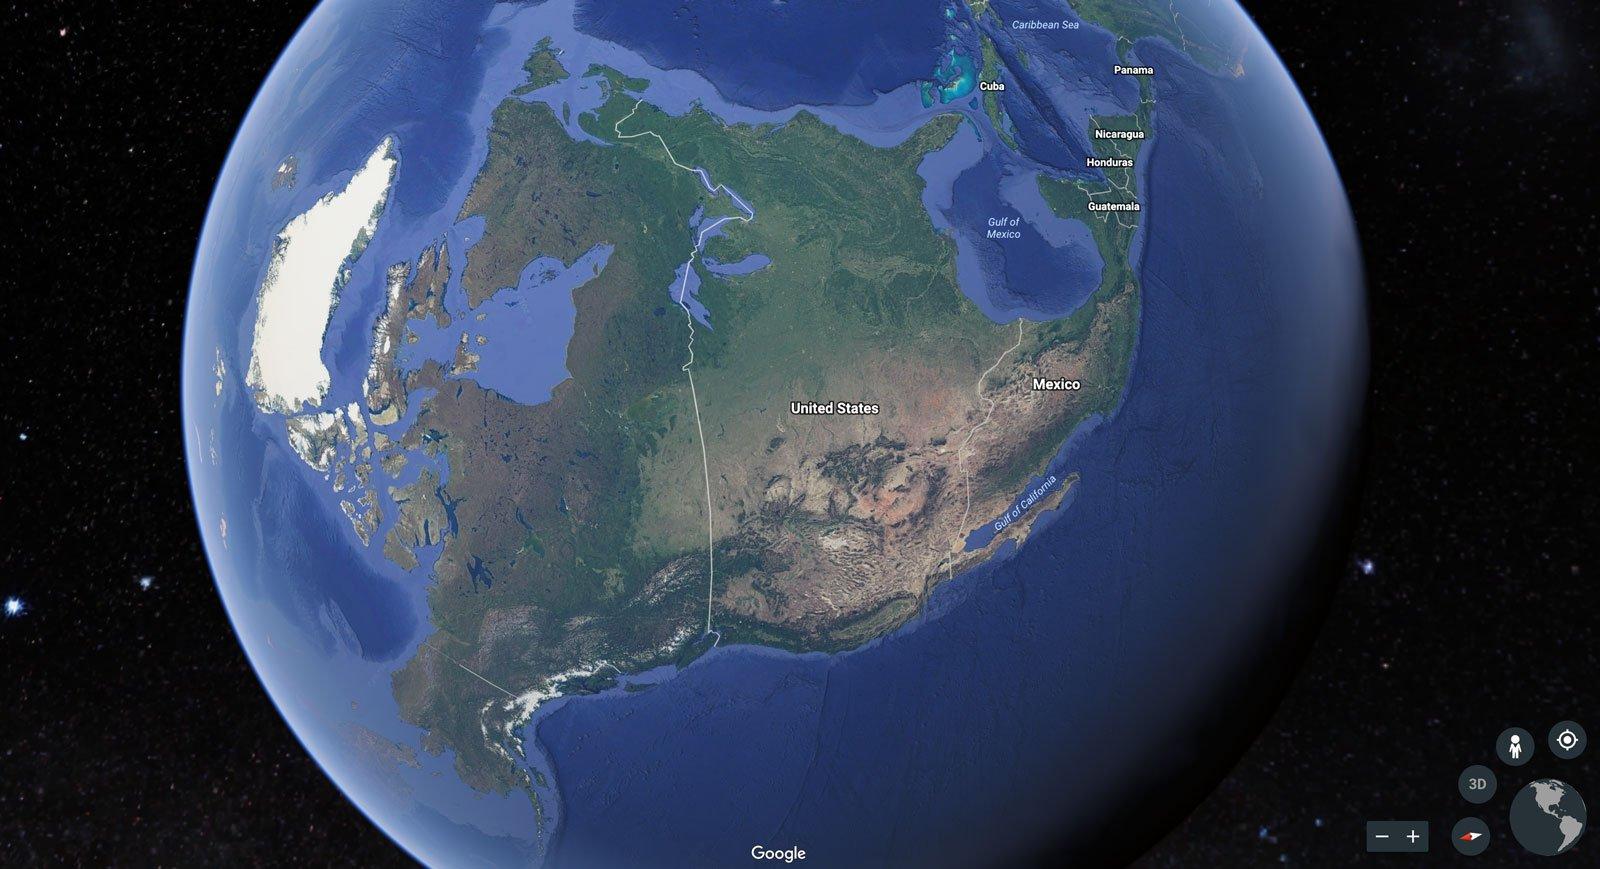 New Google Earth App